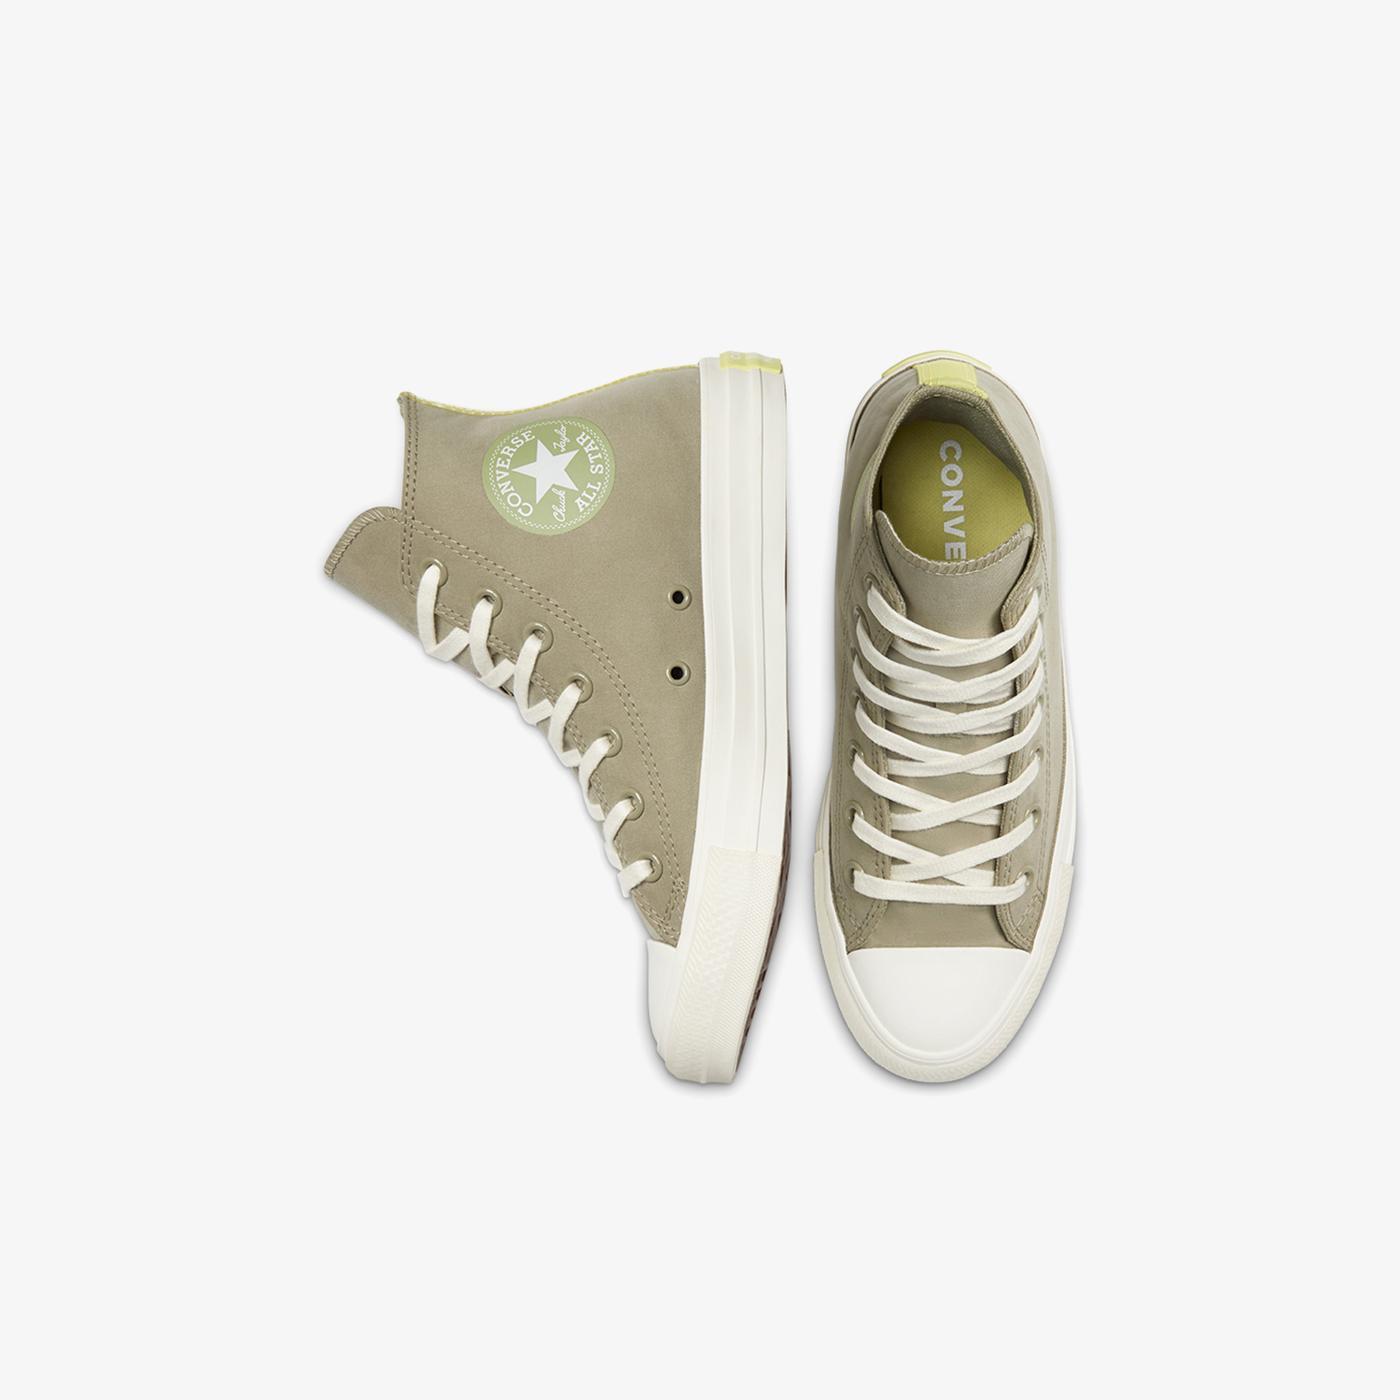 Converse Chuck Taylor All Star Peached Perfect Hi Kadın Gri Sneaker